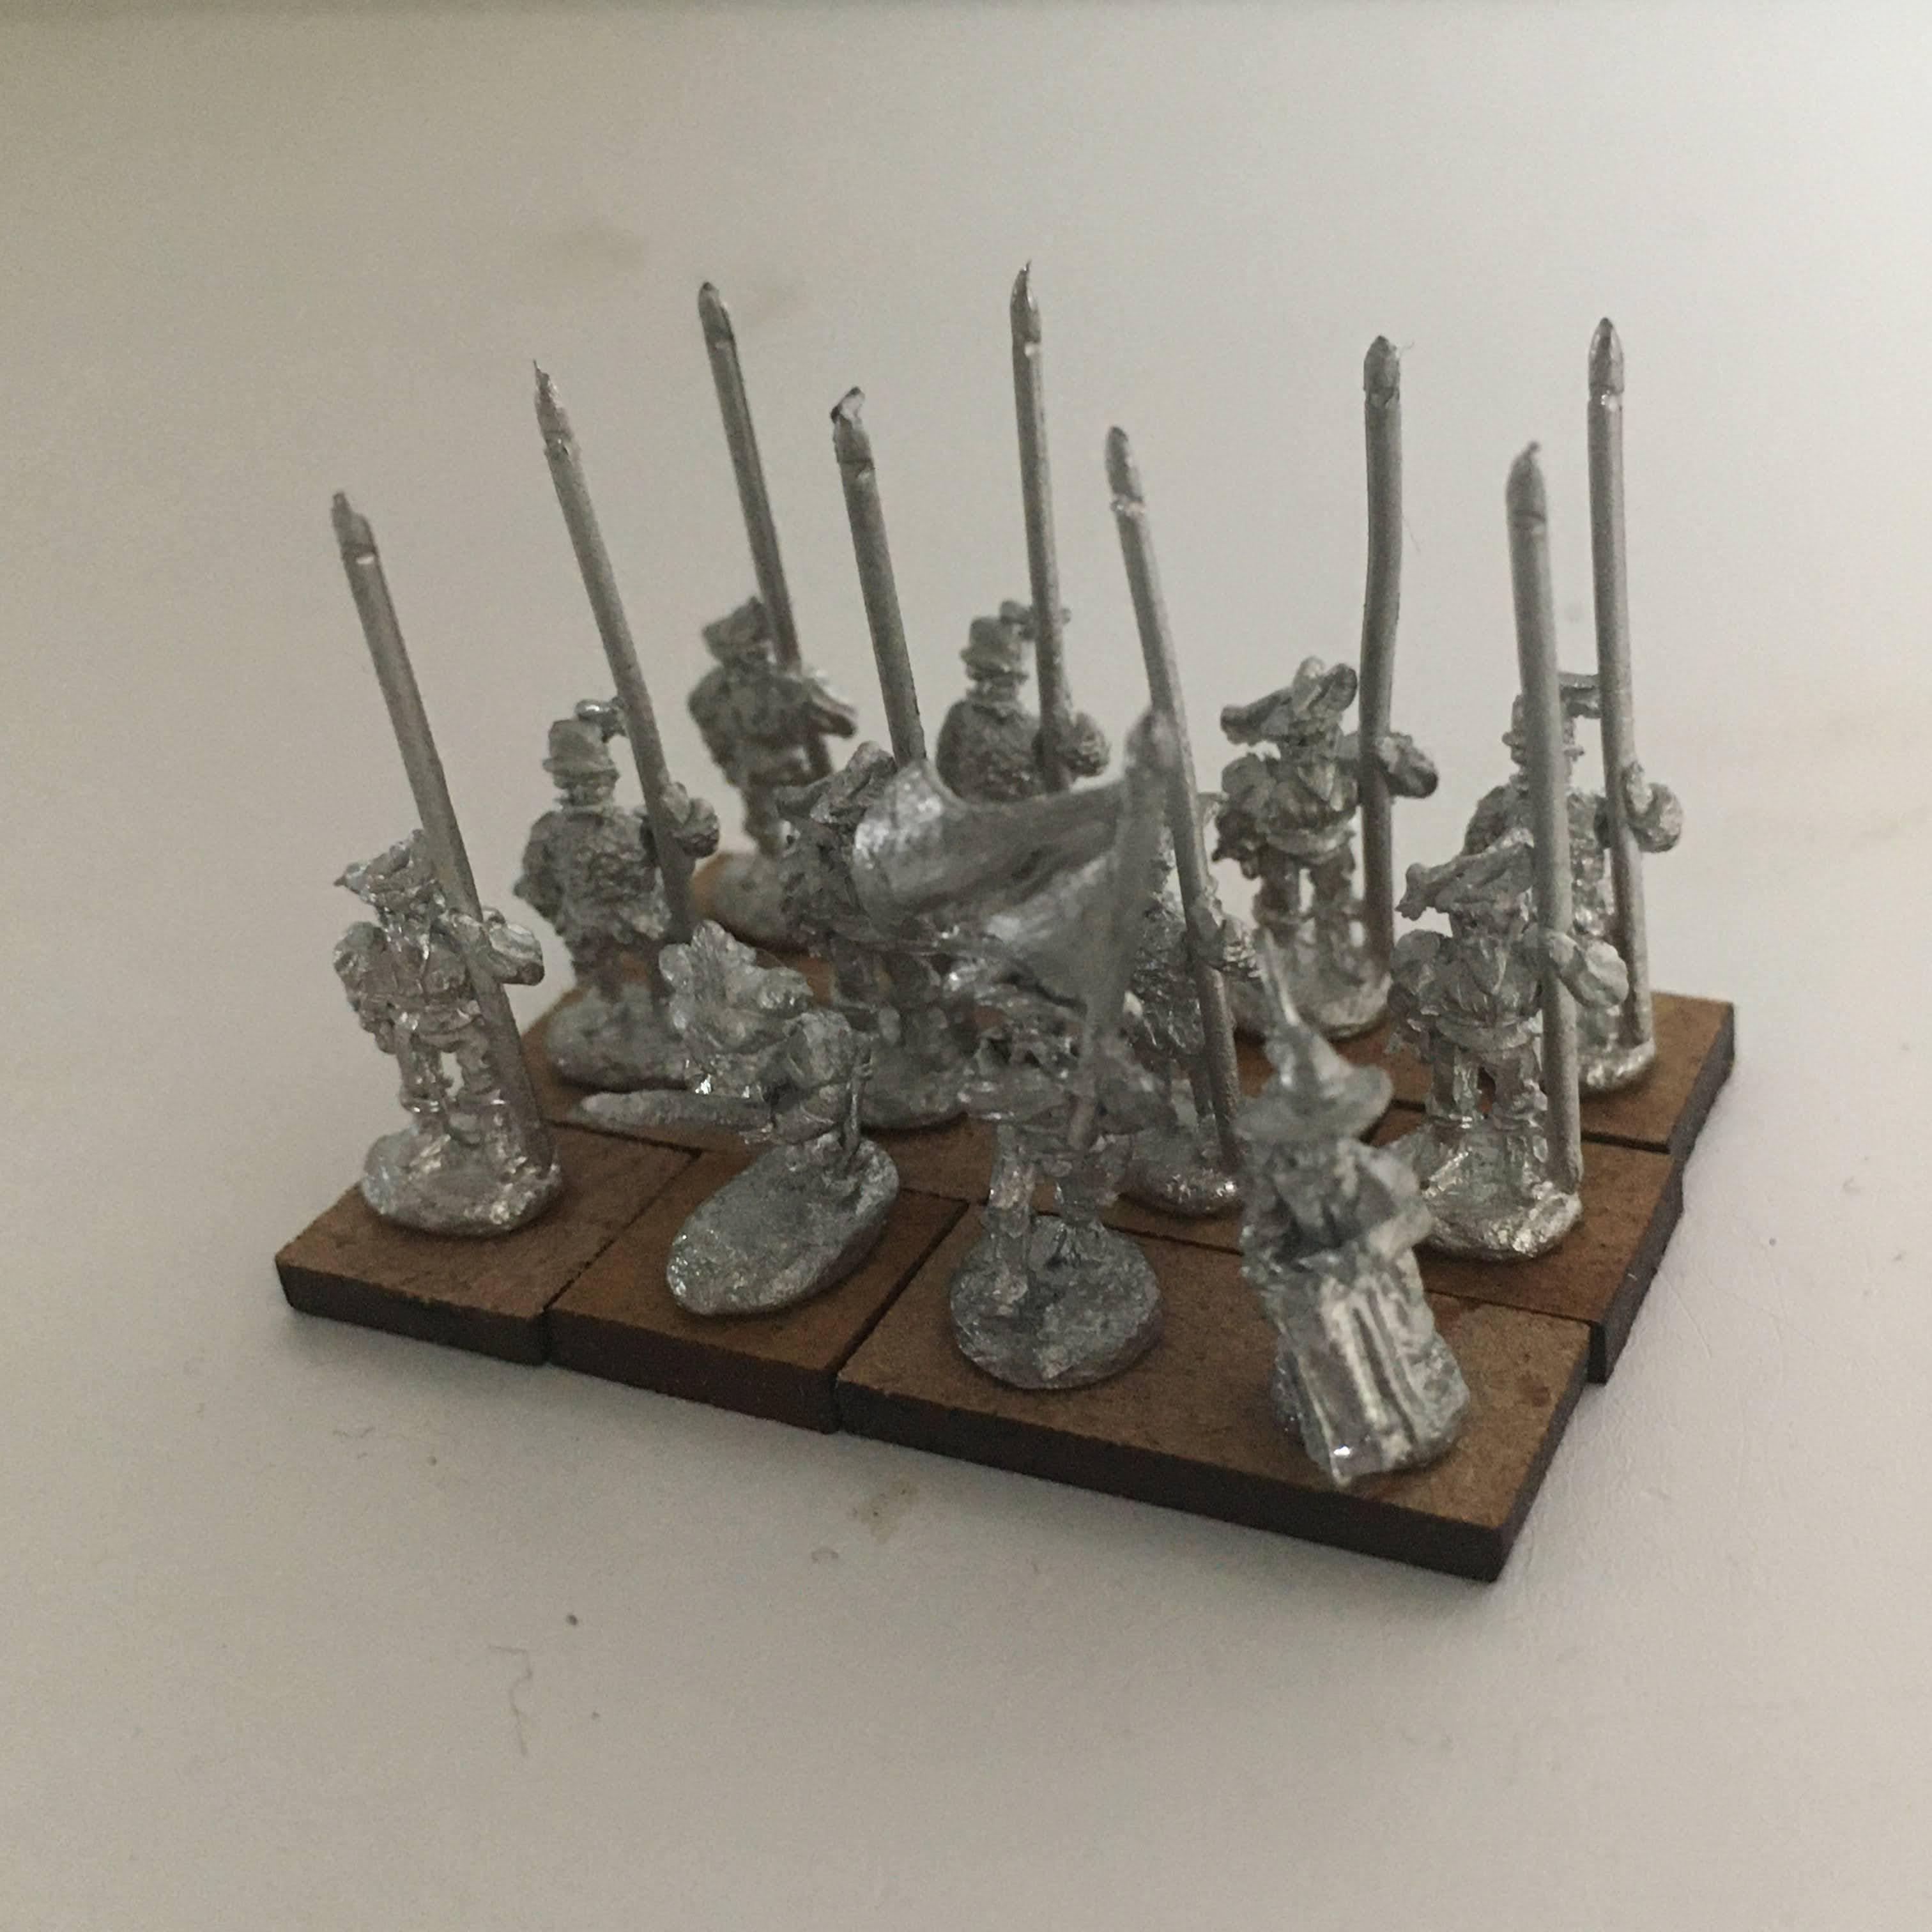 a unit of 12 spearmen